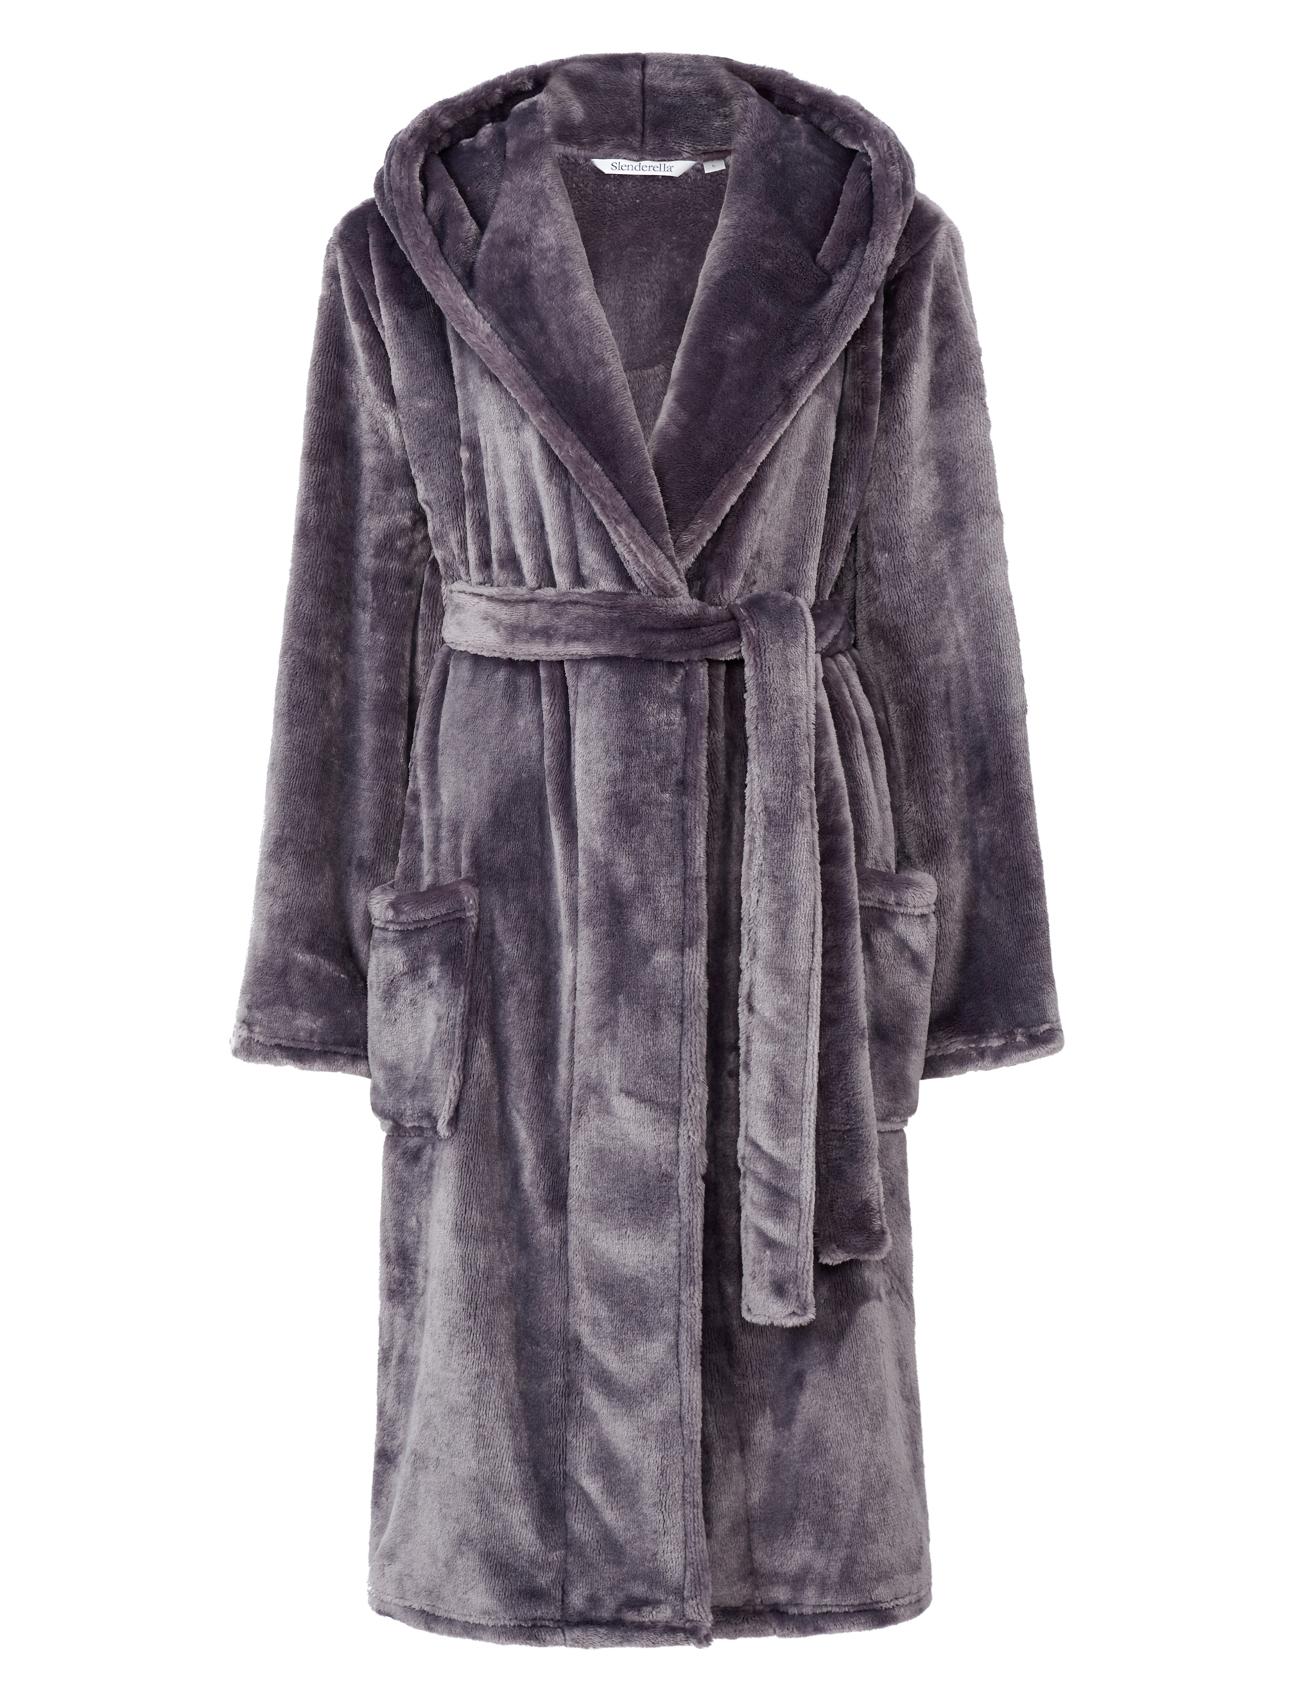 8803e613ec Slenderella Ladies Super Soft Thick Fleece Dressing Gown Luxury ...